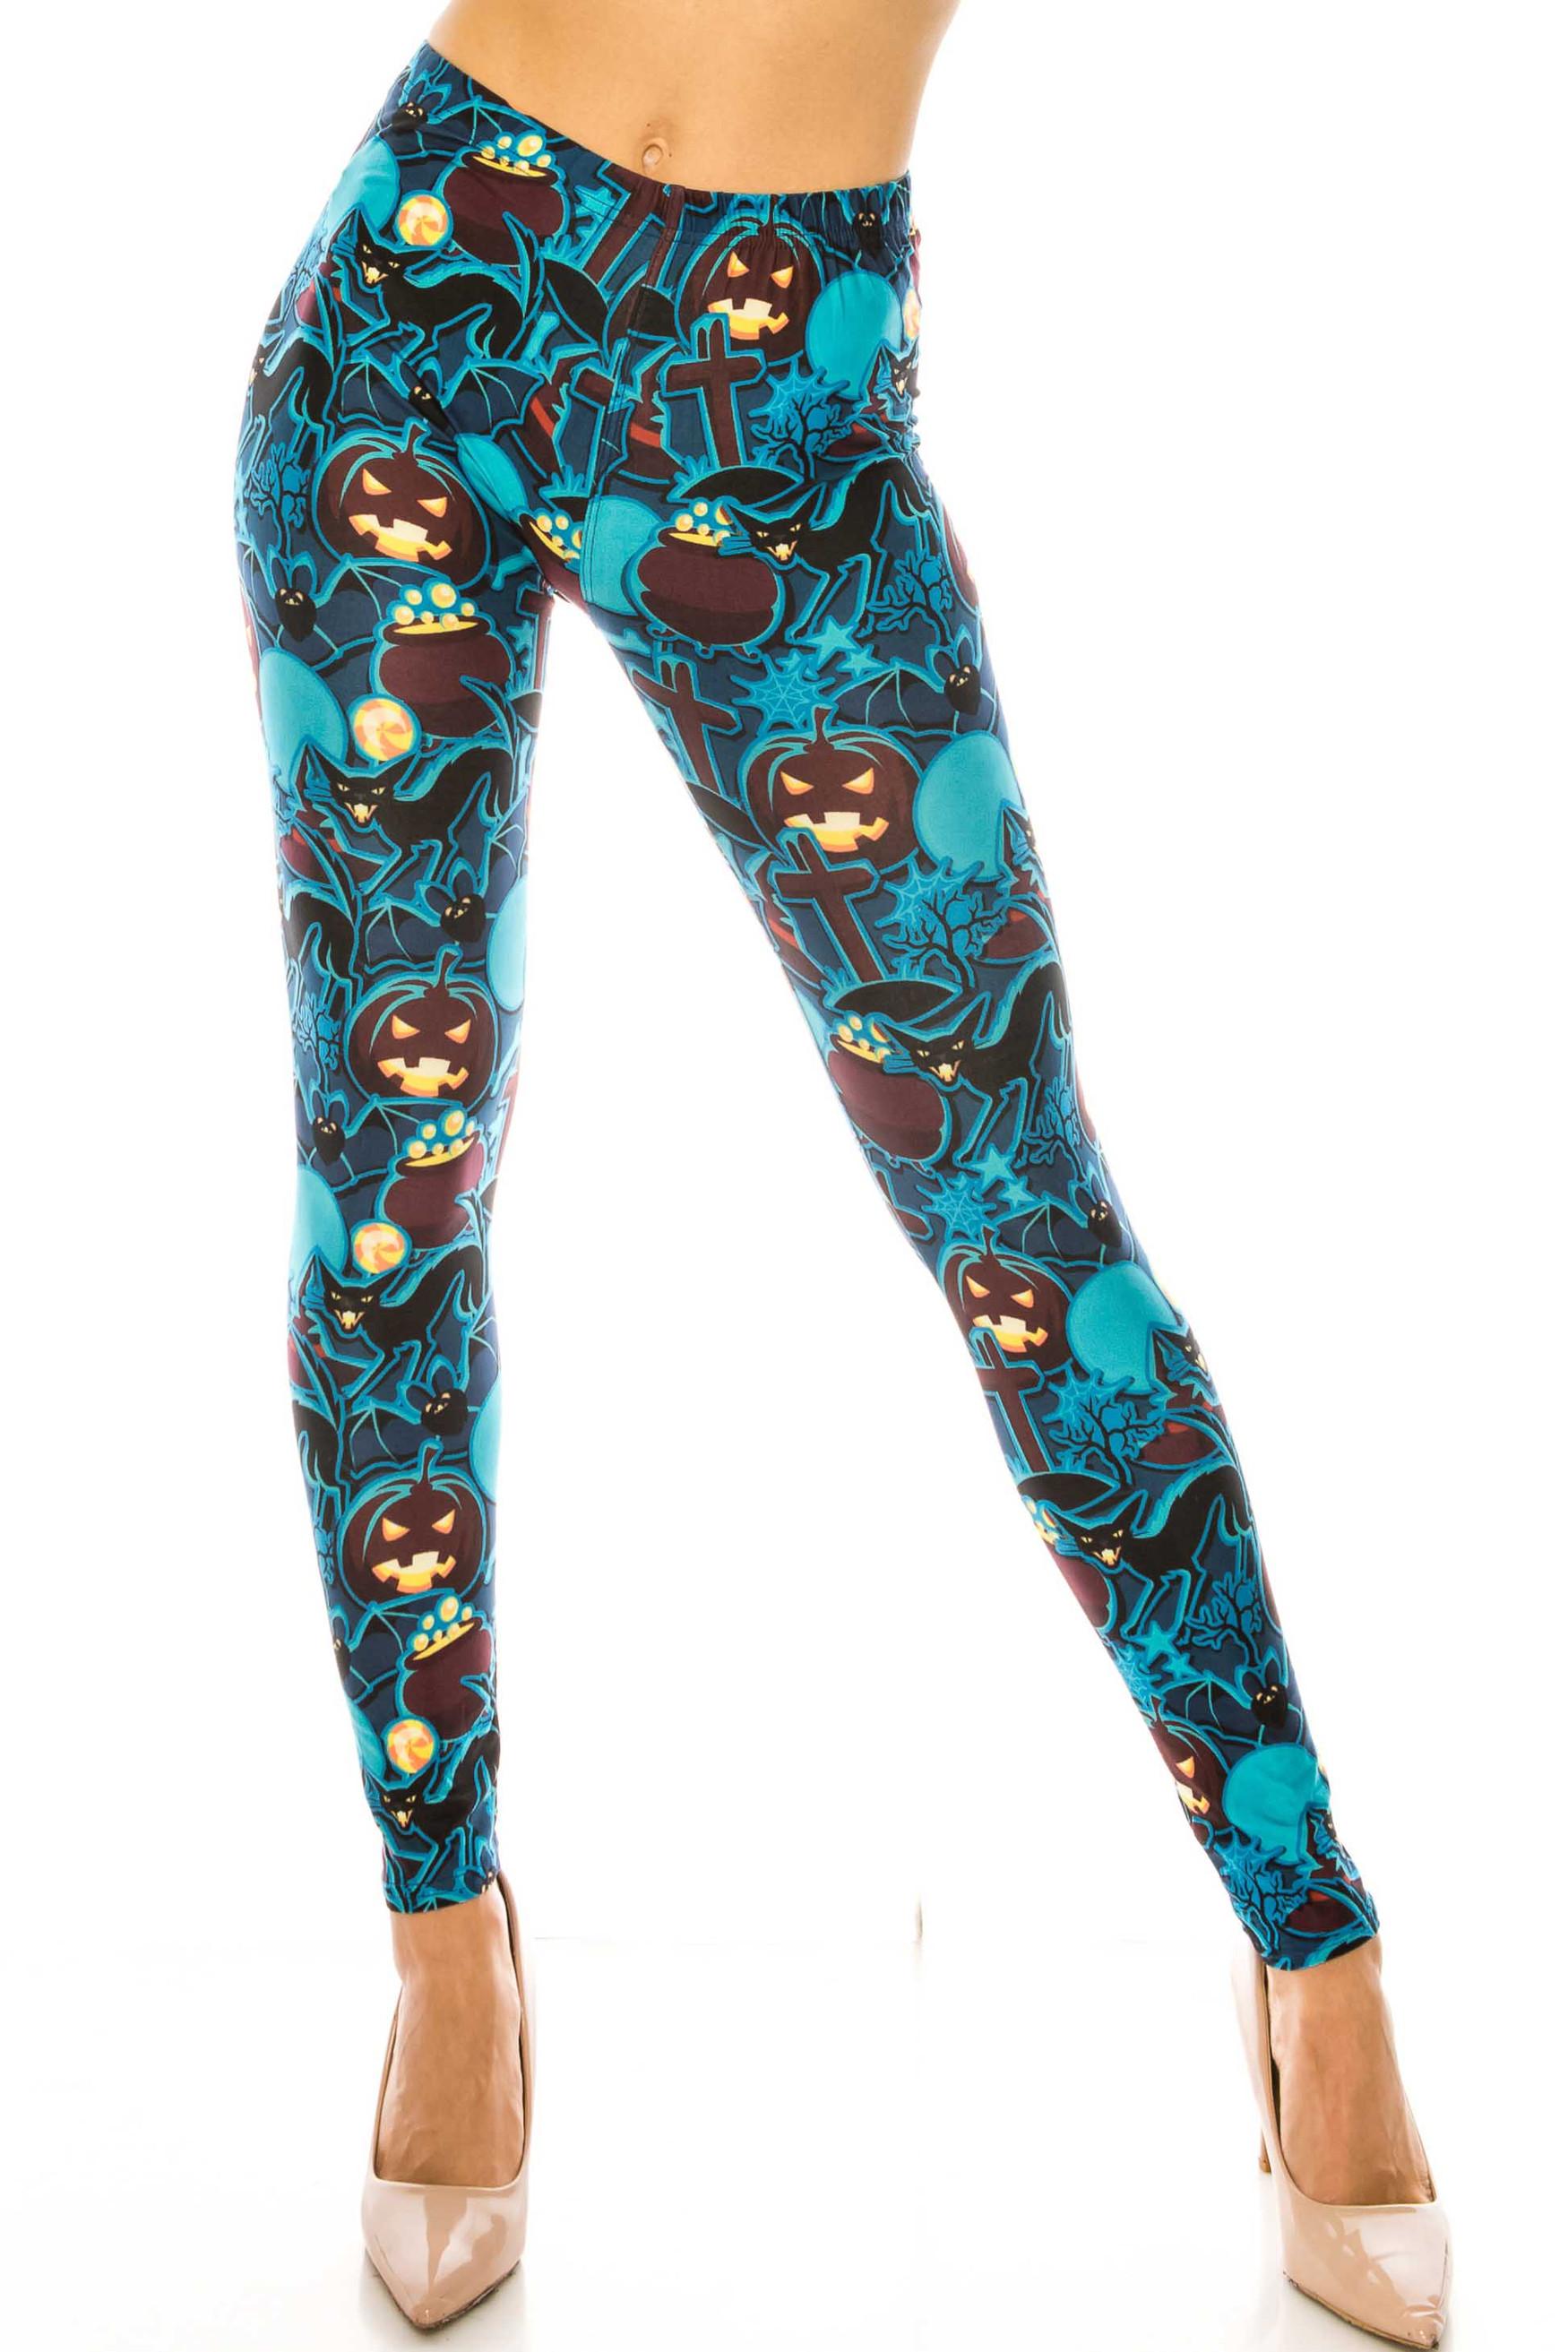 Creamy Soft Electric Blue Halloween Leggings - USA Fashion™